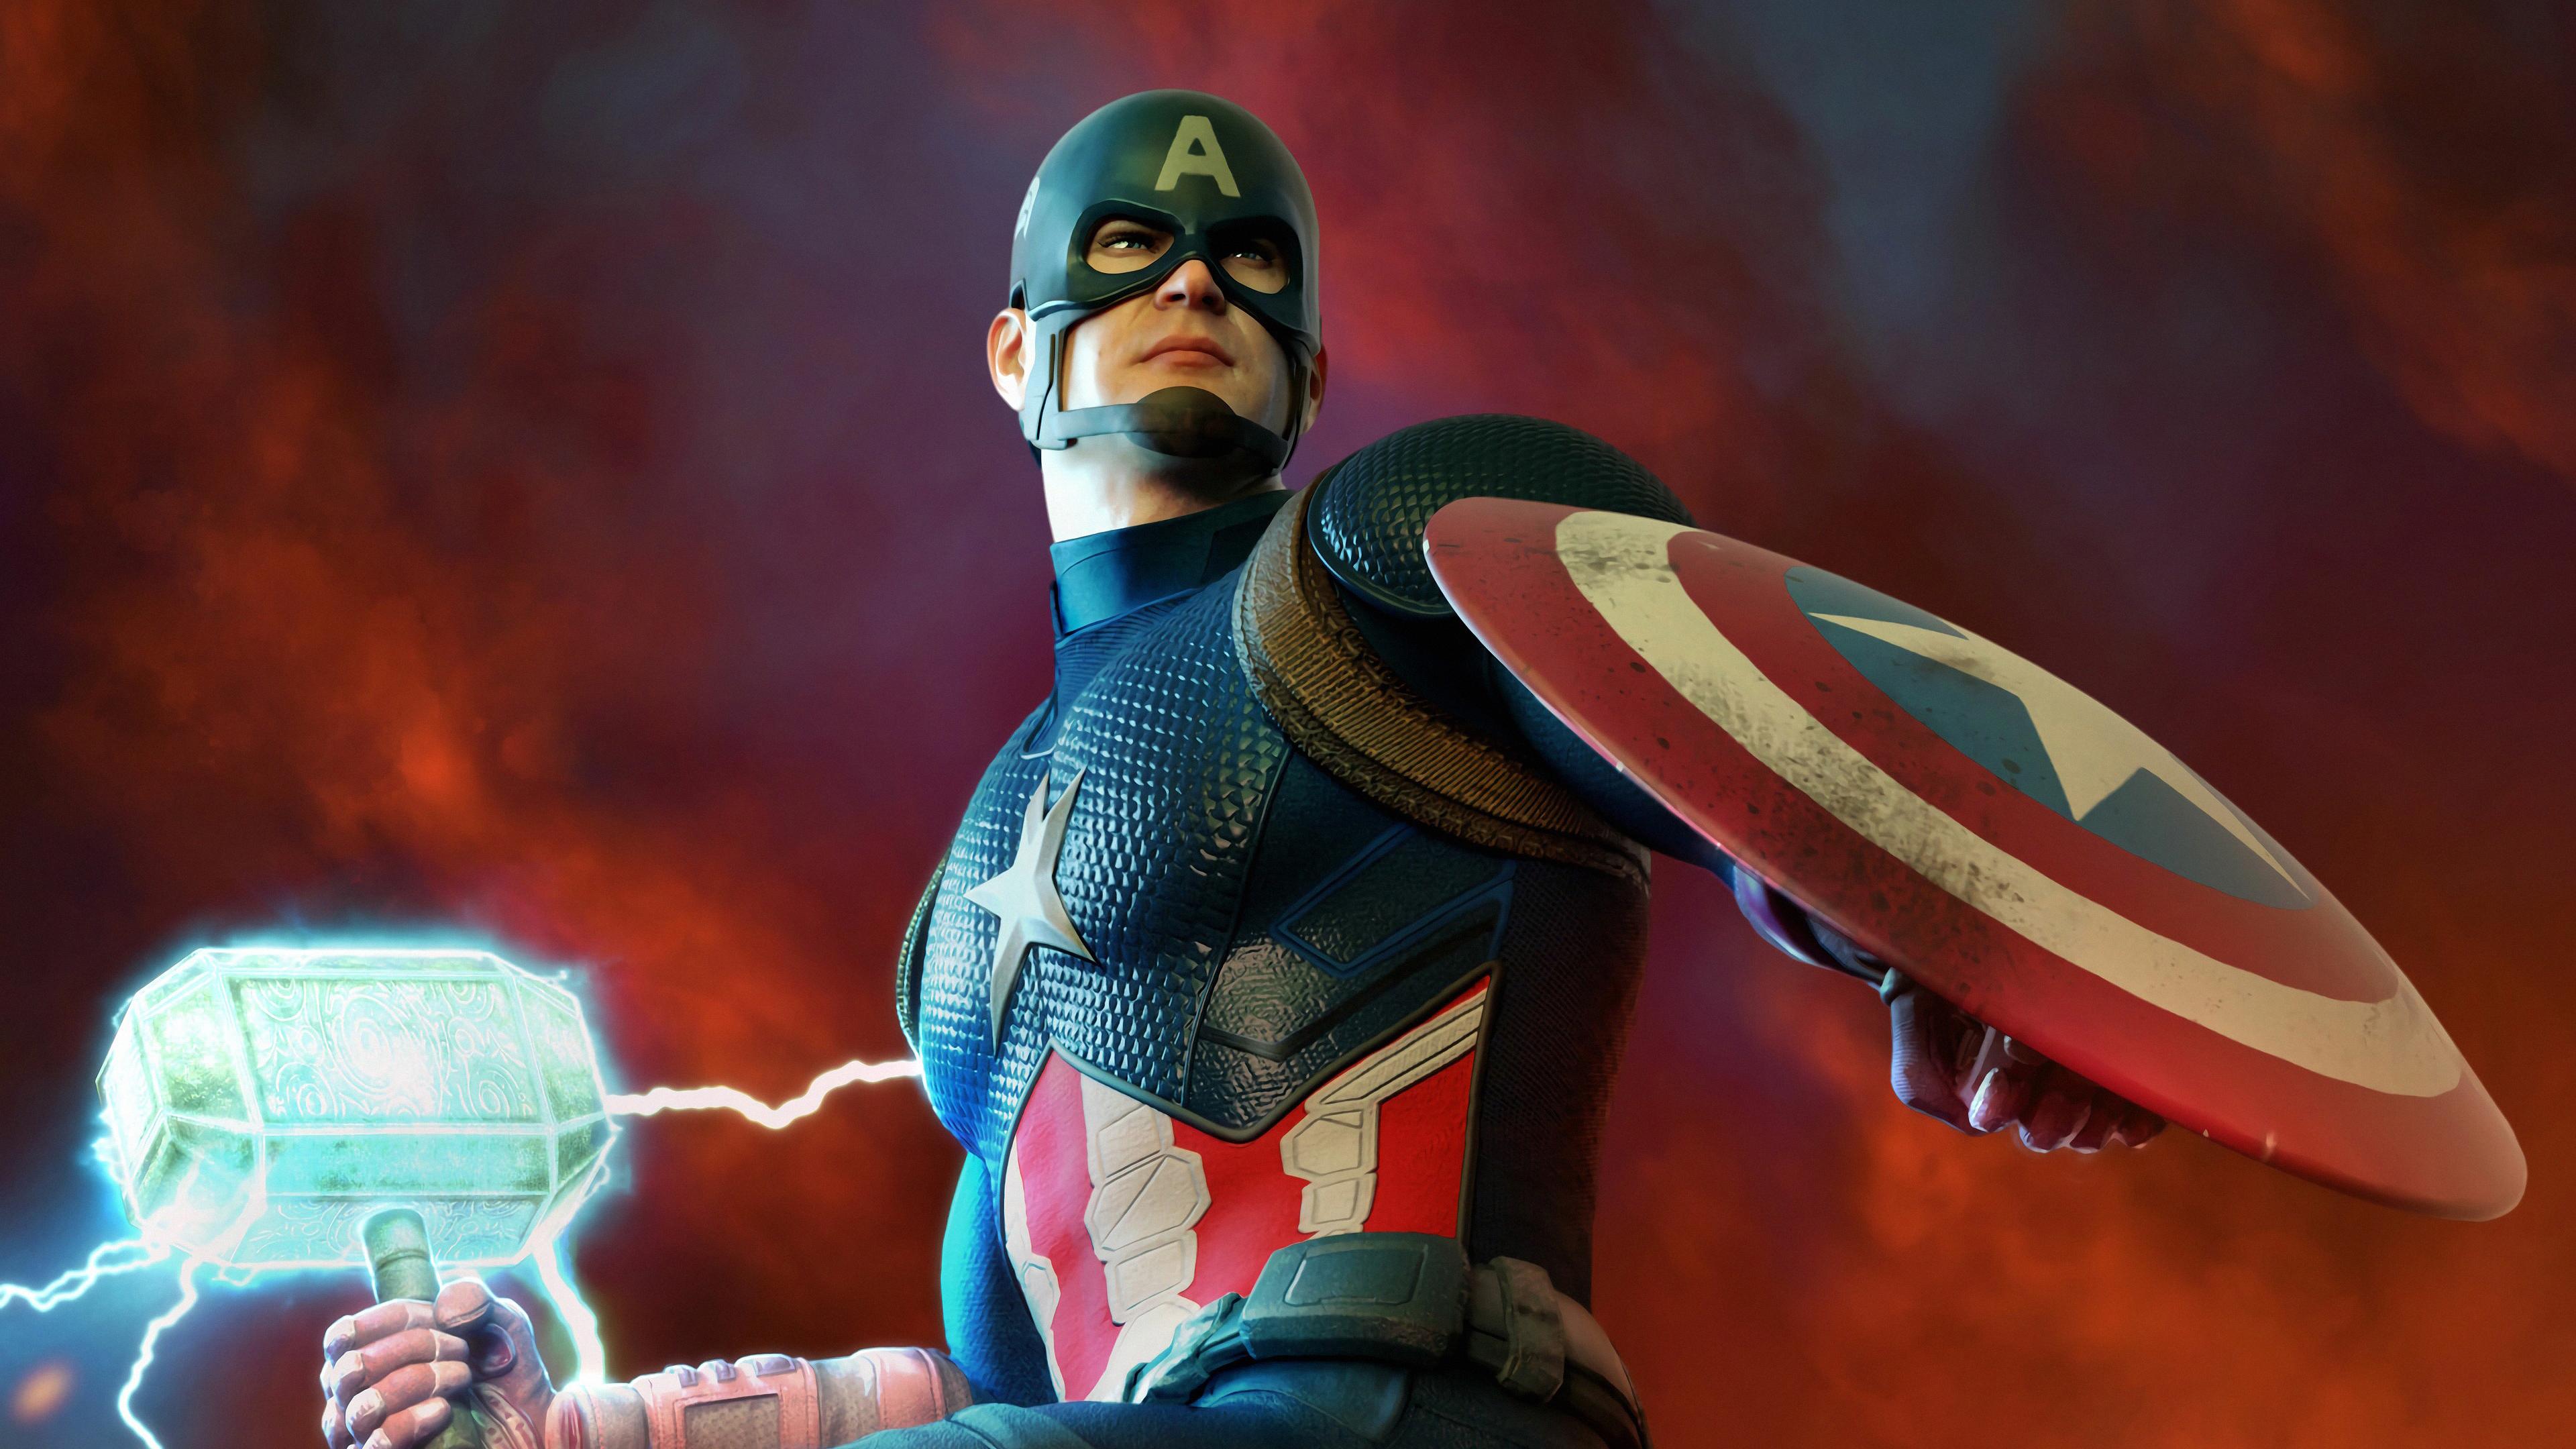 captain america mjolnir and shield 1569186541 - Captain America Mjolnir And Shield - superheroes wallpapers, hd-wallpapers, captain america wallpapers, artwork wallpapers, 4k-wallpapers